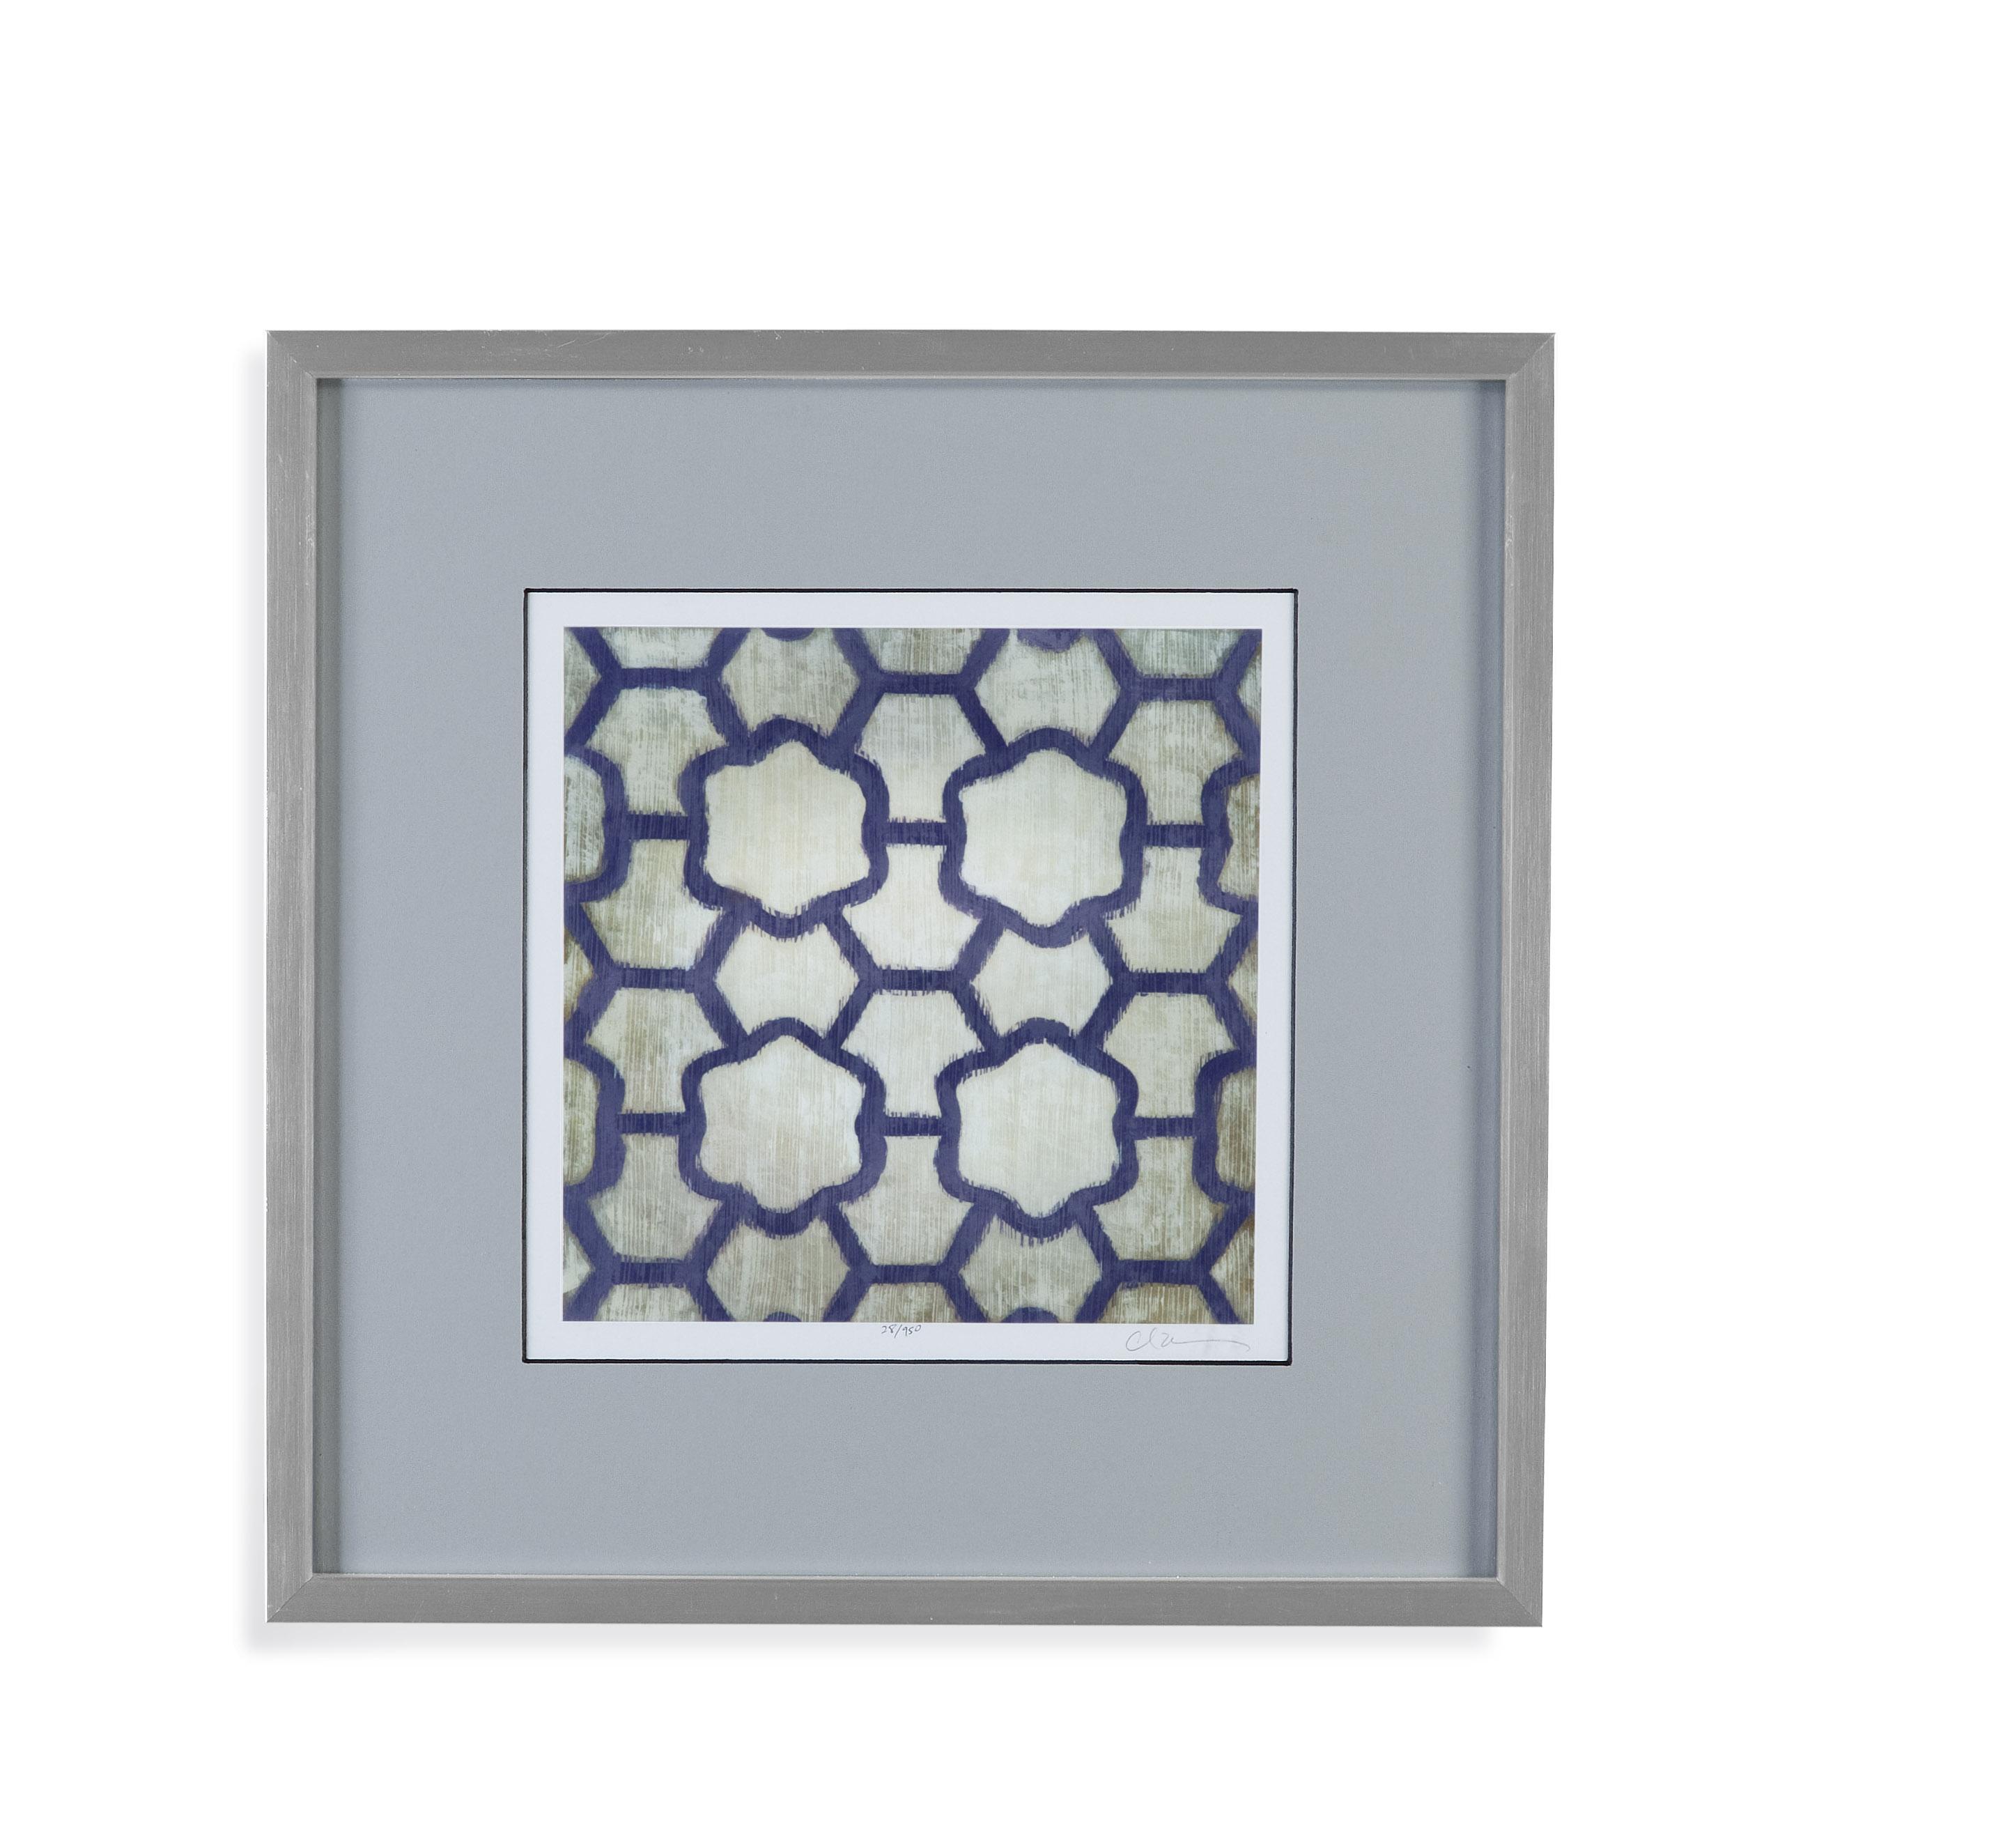 Thoroughly Modern Spectrum Symmetry III by Bassett Mirror at Alison Craig Home Furnishings